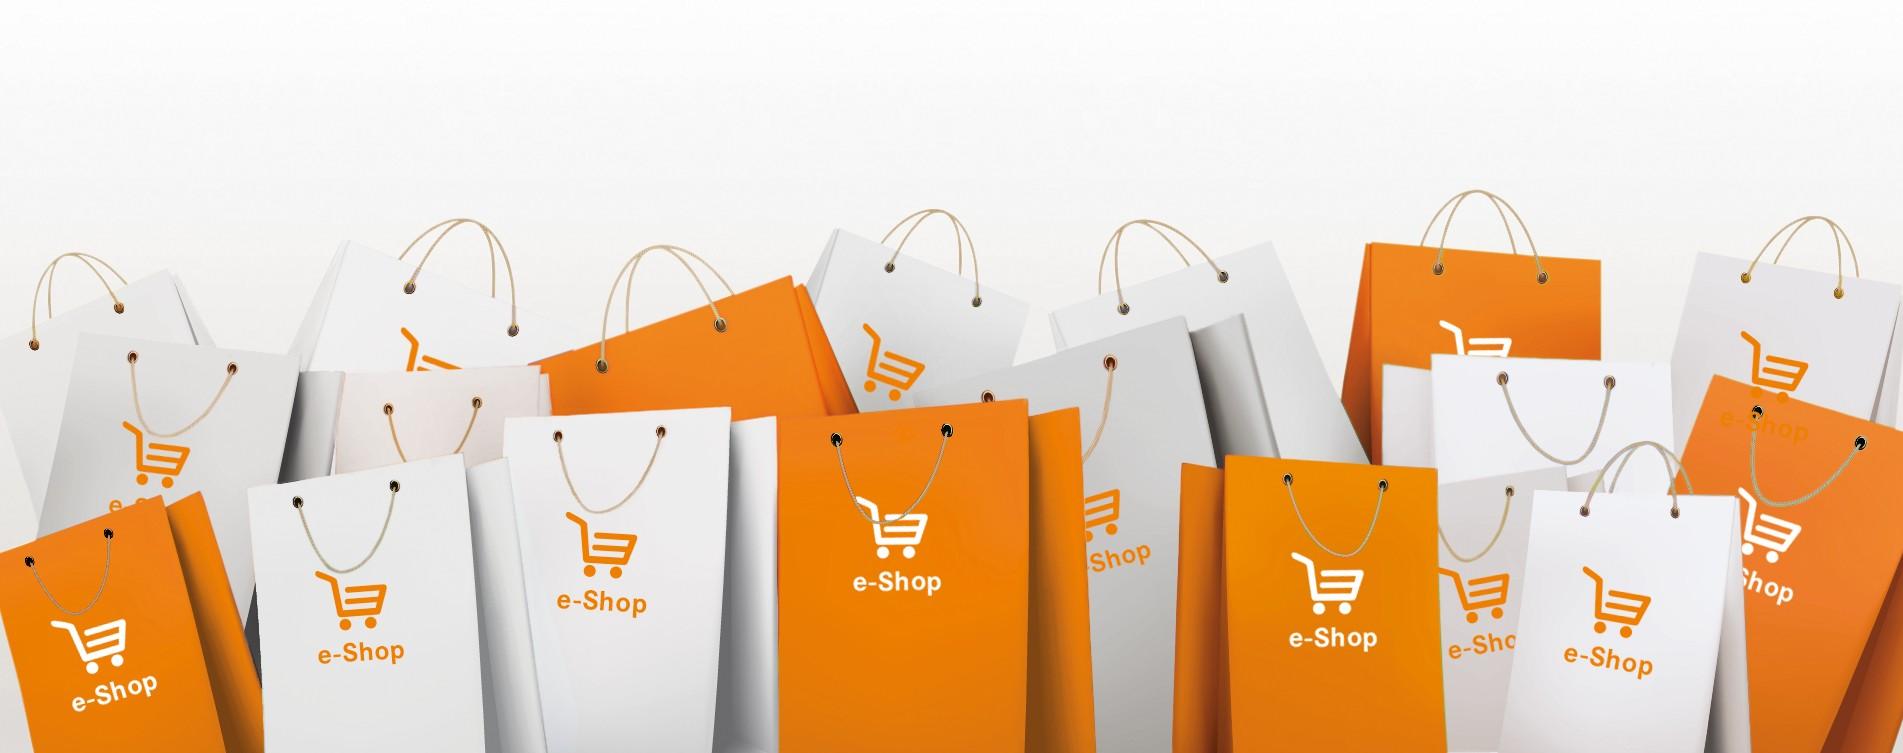 zum e-Shop